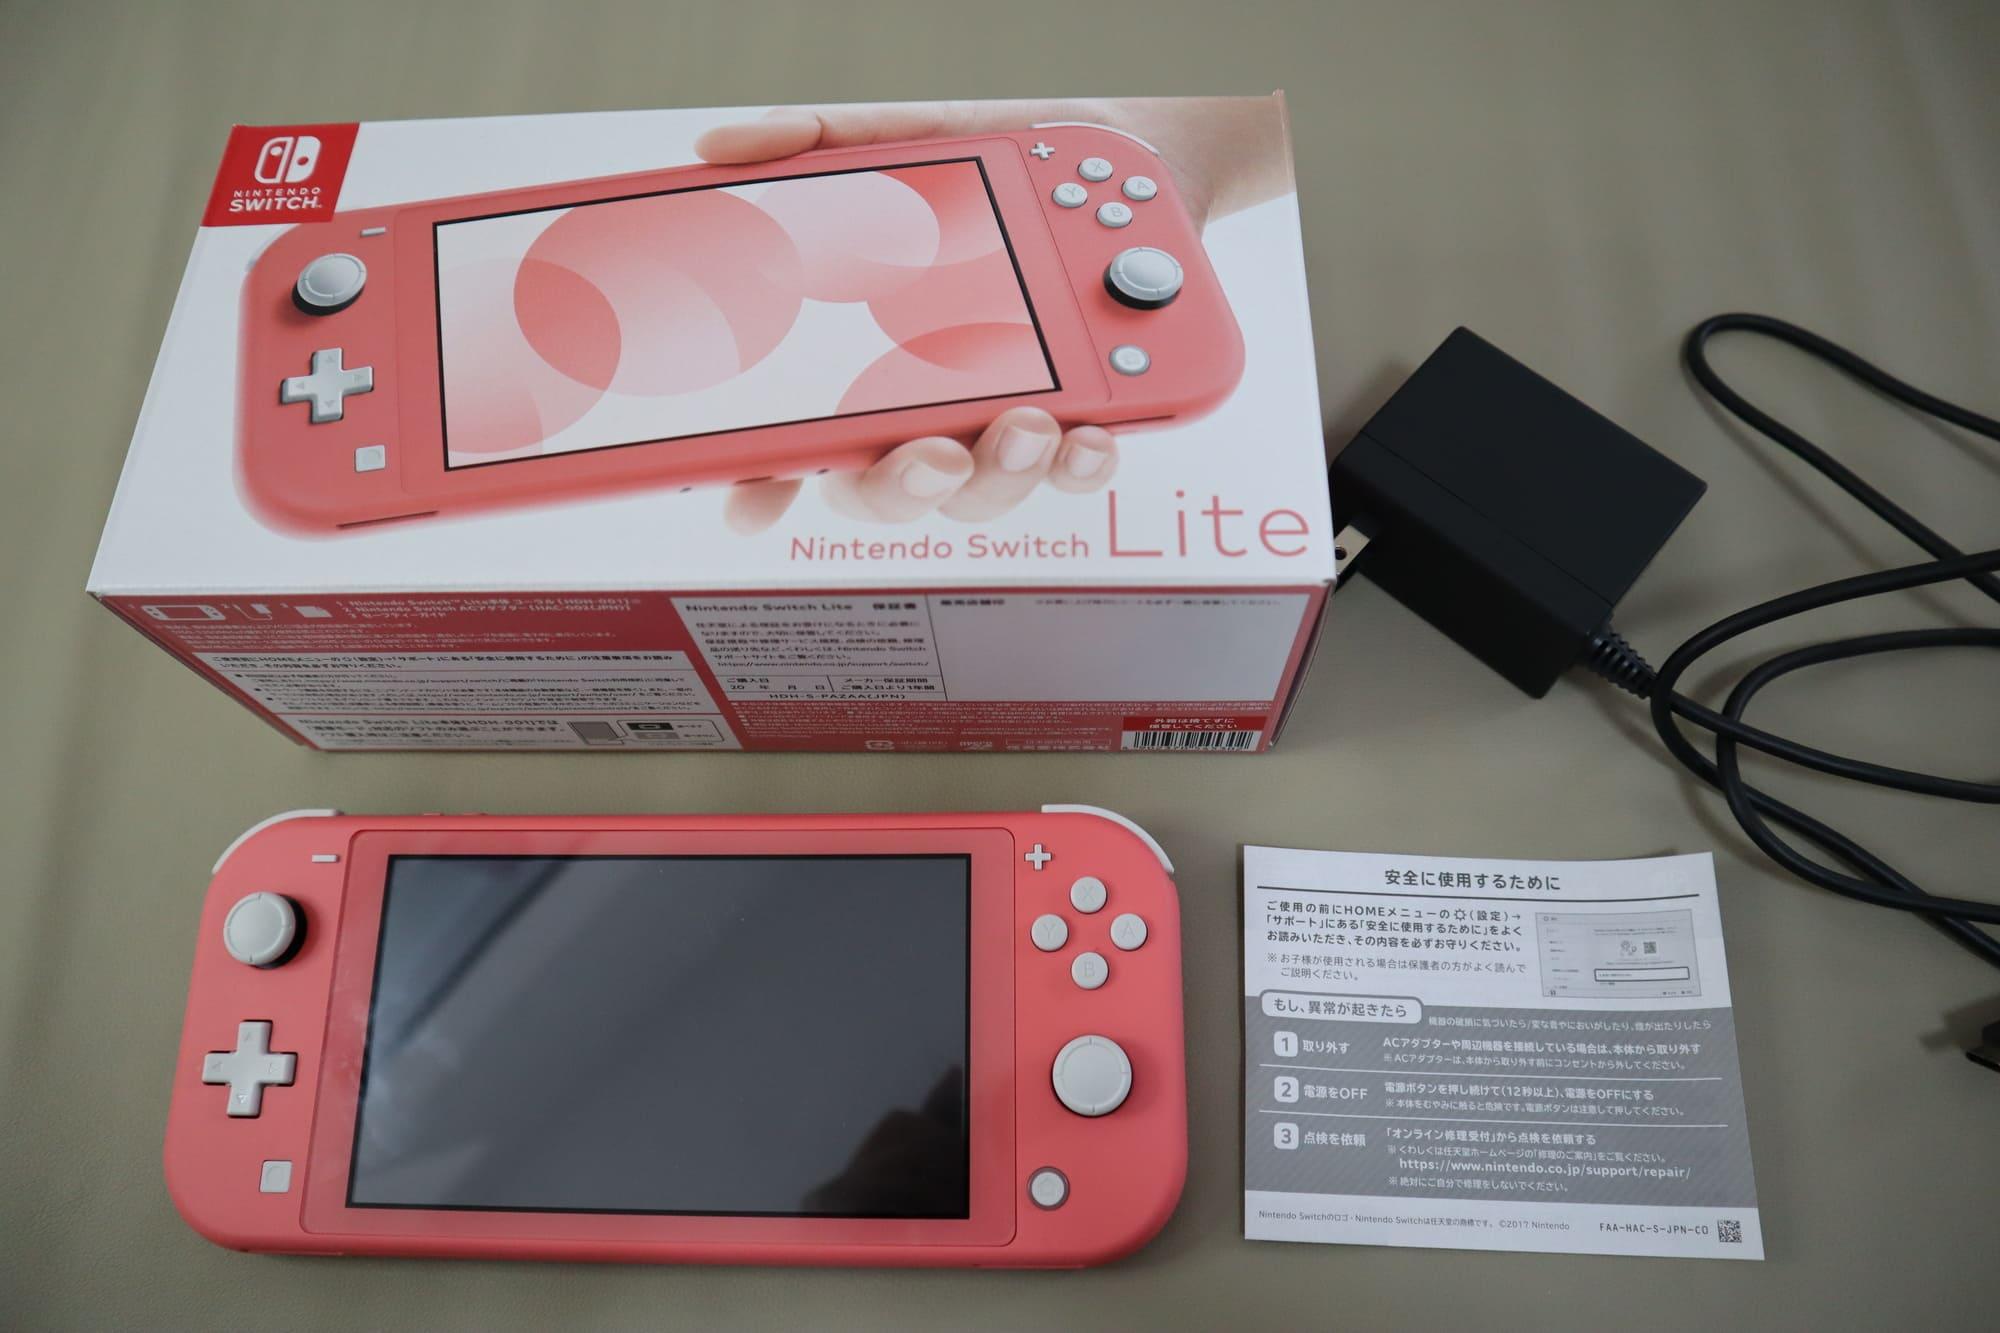 Switch Liteの同梱物